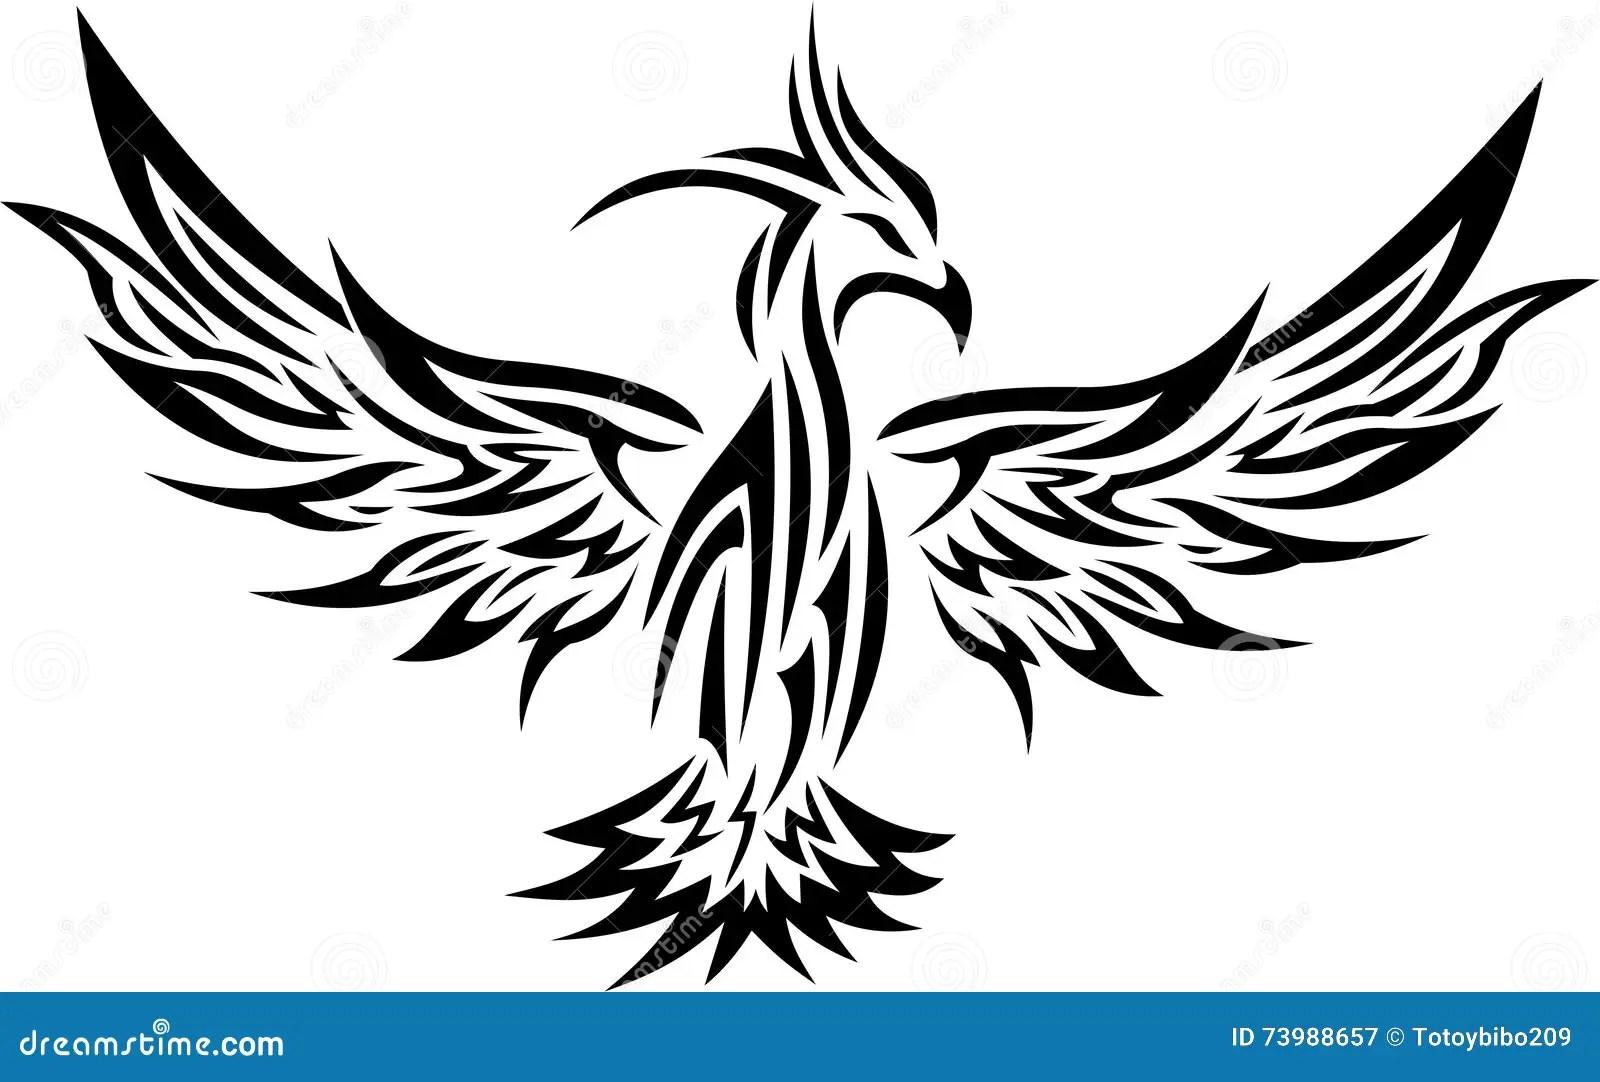 Tribal Tattoo Drawings Birds